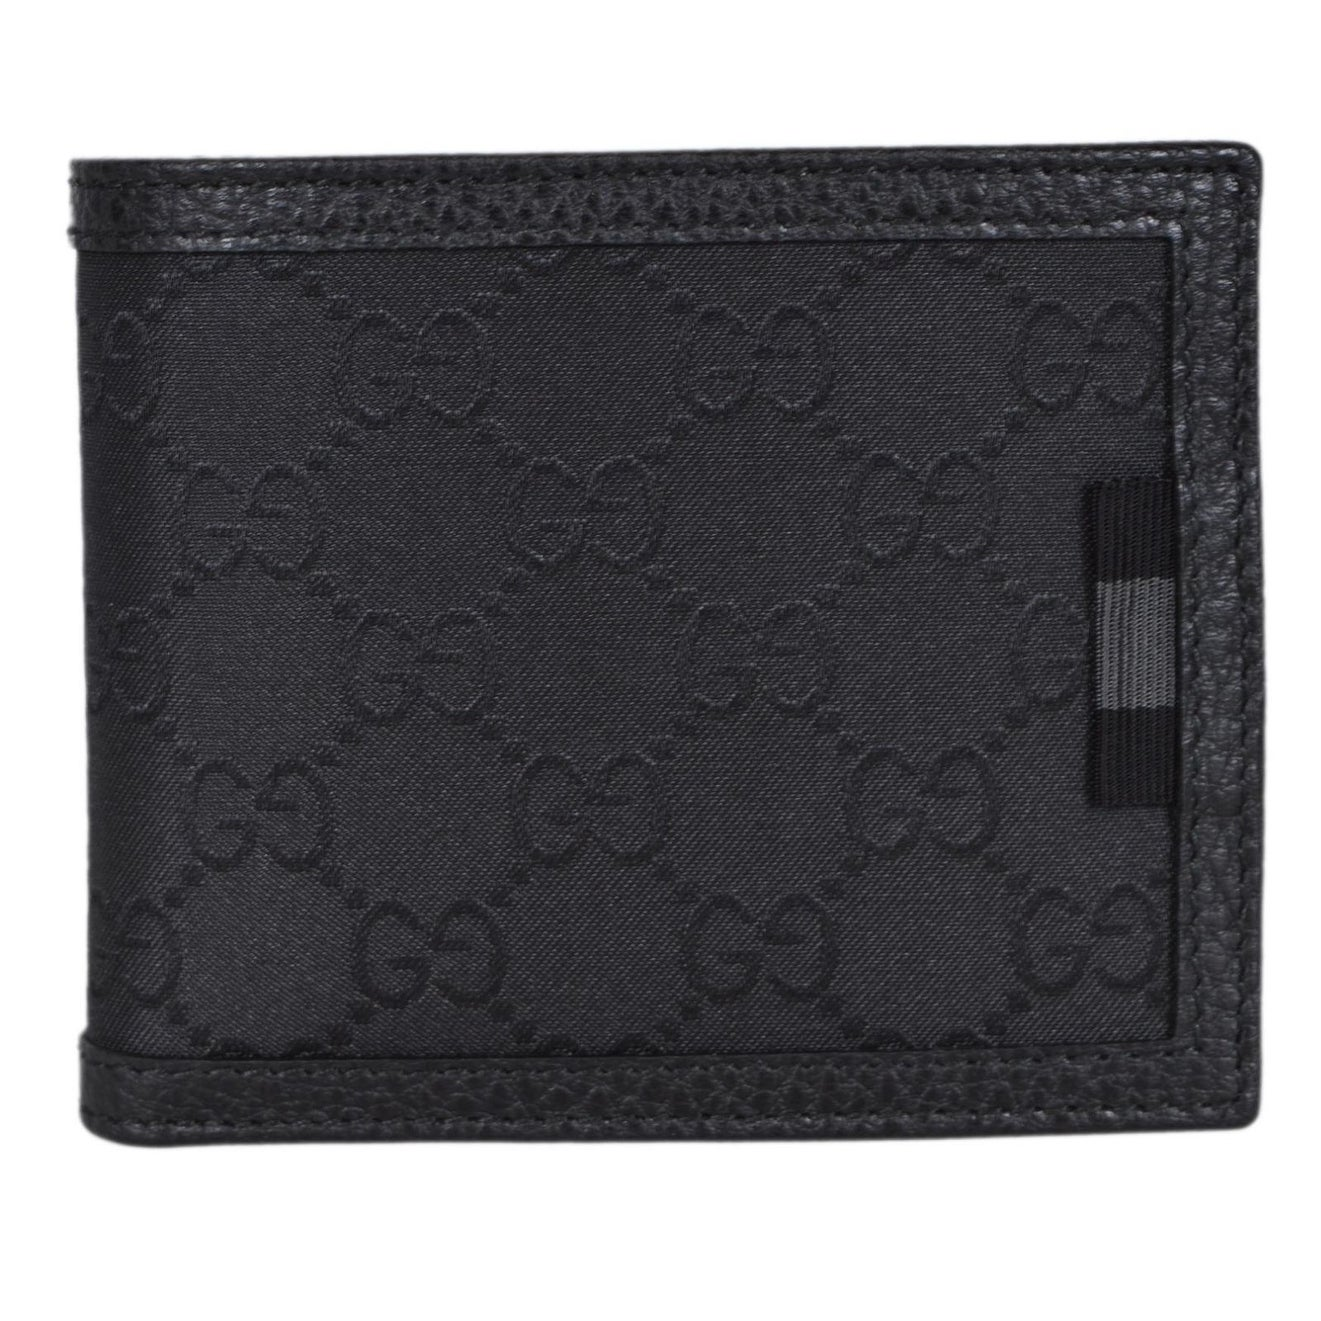 8bd264dc8a6b Buy Designer Wallets Online at Overstock | Our Best Designer Accessories  Deals